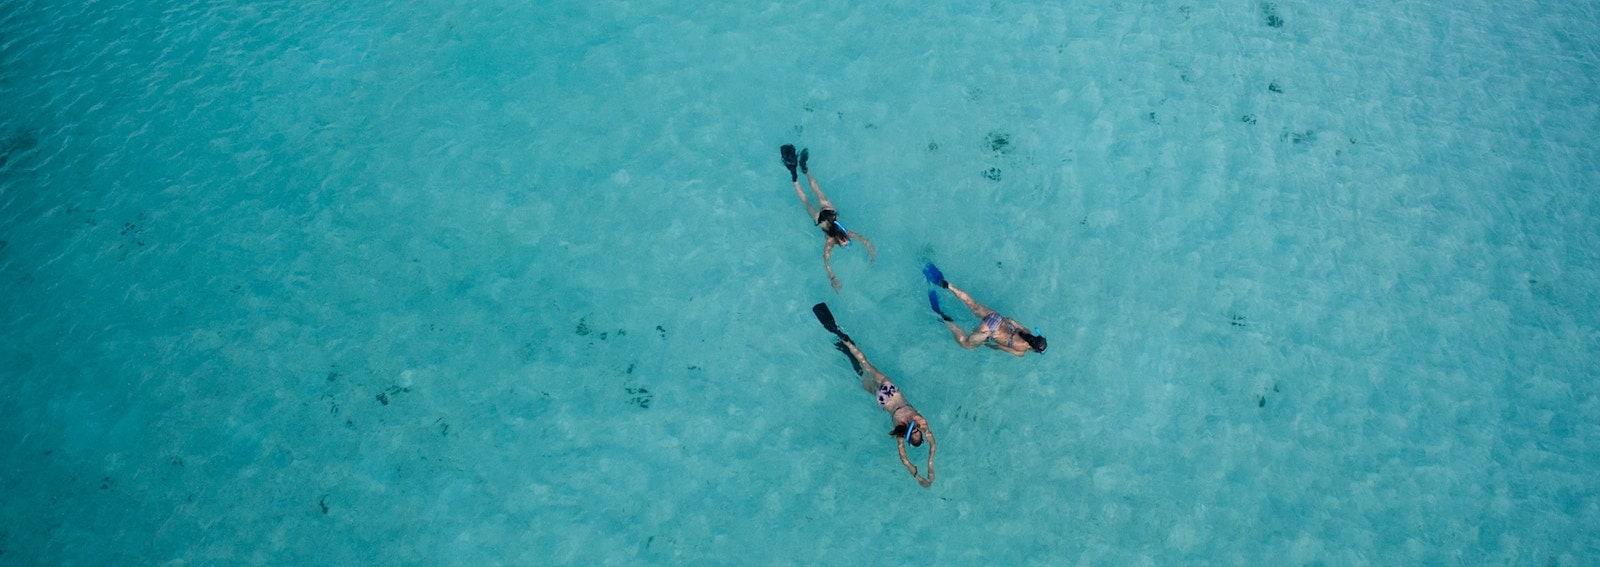 mare snorkeling foto hero grande